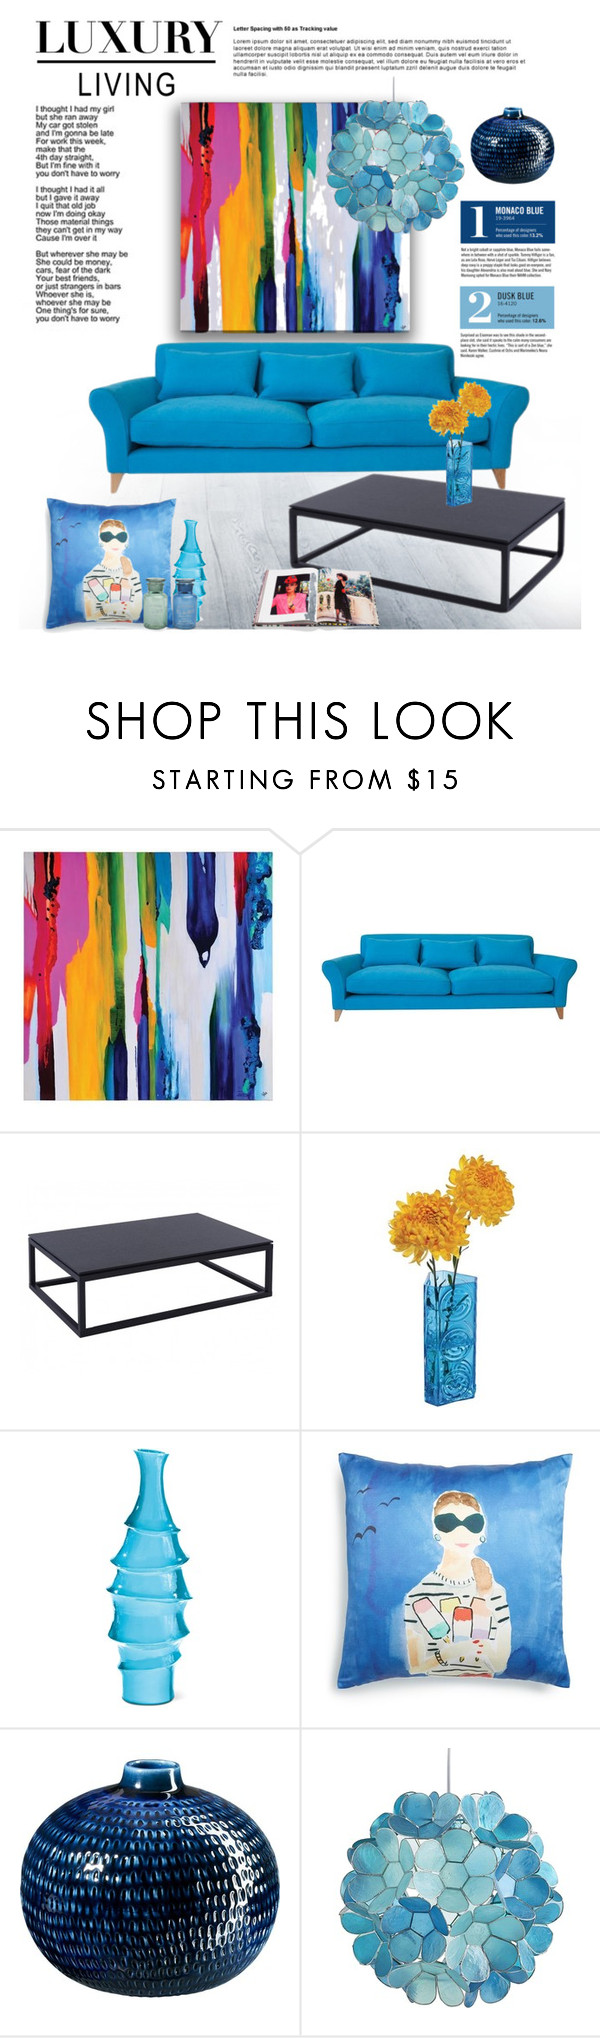 """Color your Life!"" by cruzeirodotejo ❤ liked on Polyvore featuring interior, interiors, interior design, home, home decor, interior decorating, Dartington Crystal, Kate Spade, Garance Doré and CB2"